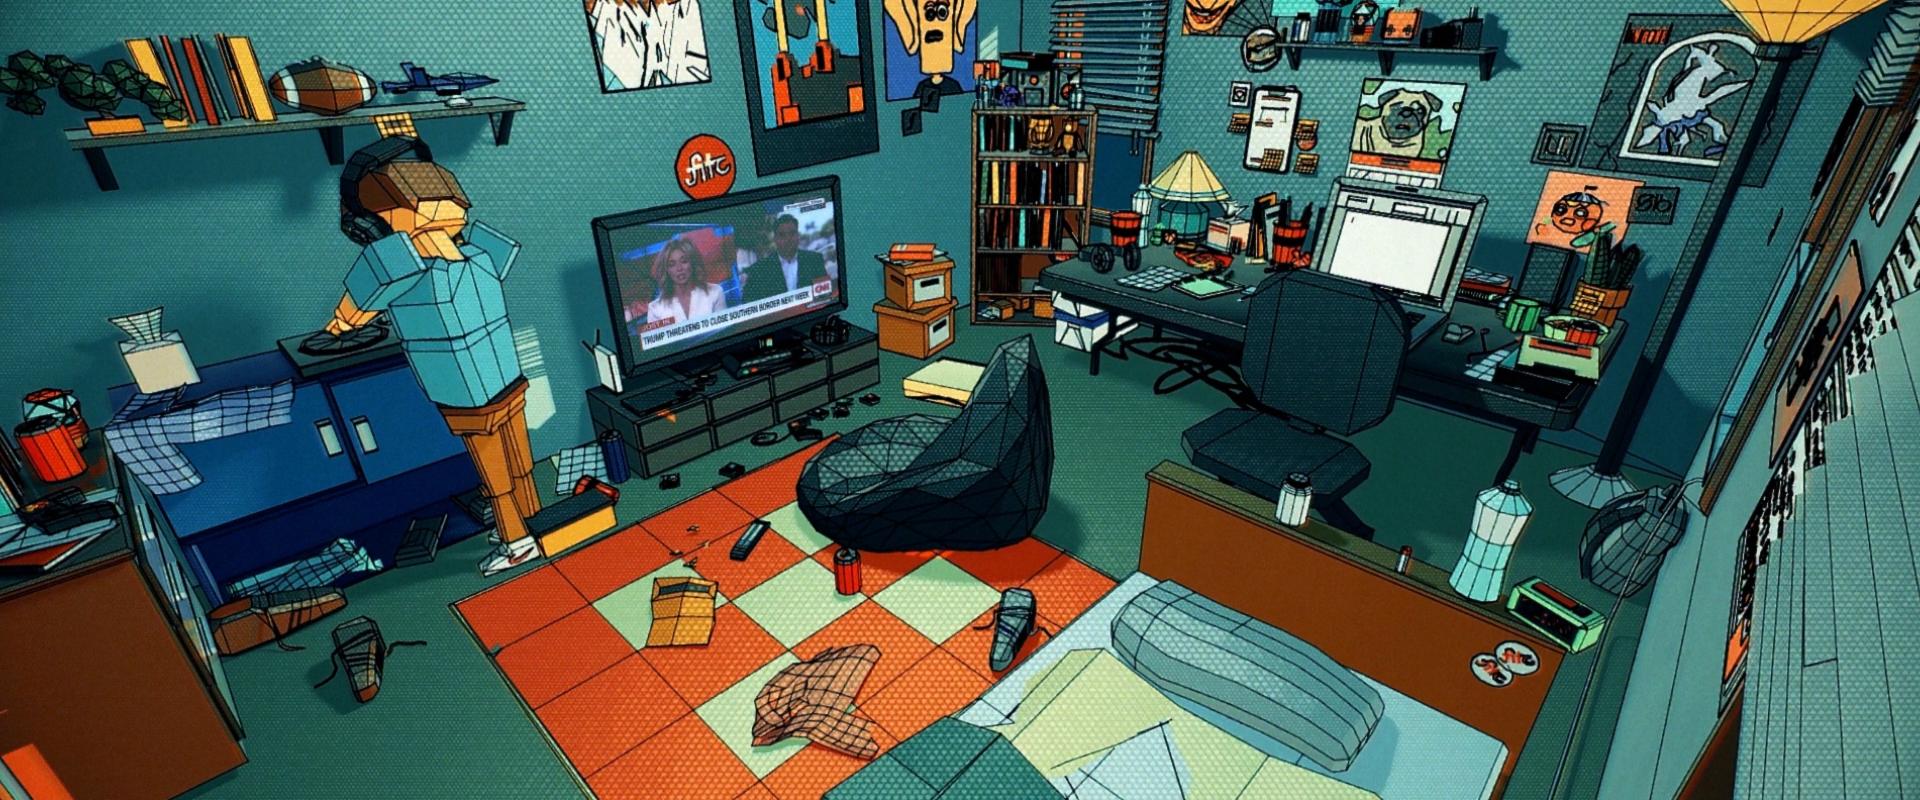 FITC_TORONTO_2019_TITLES_bedroom scene_03.png